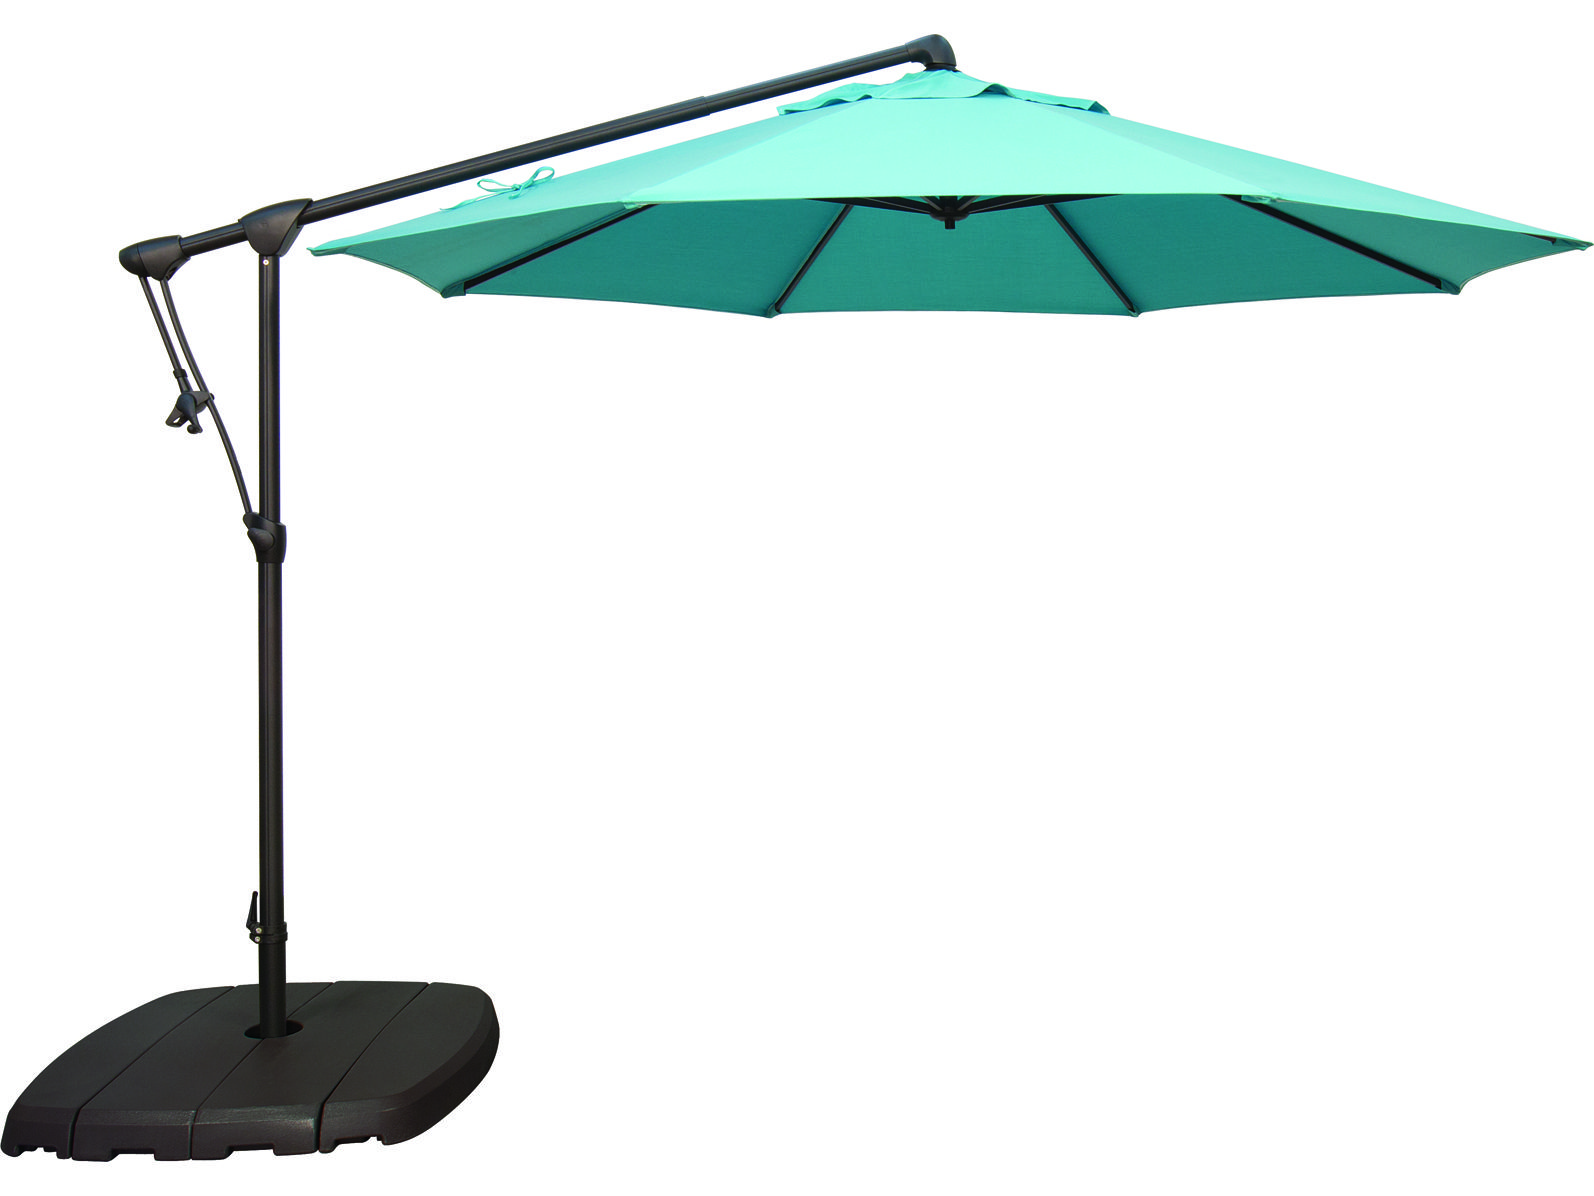 Park Art|My WordPress Blog_Garden Treasures Offset Umbrella Parts